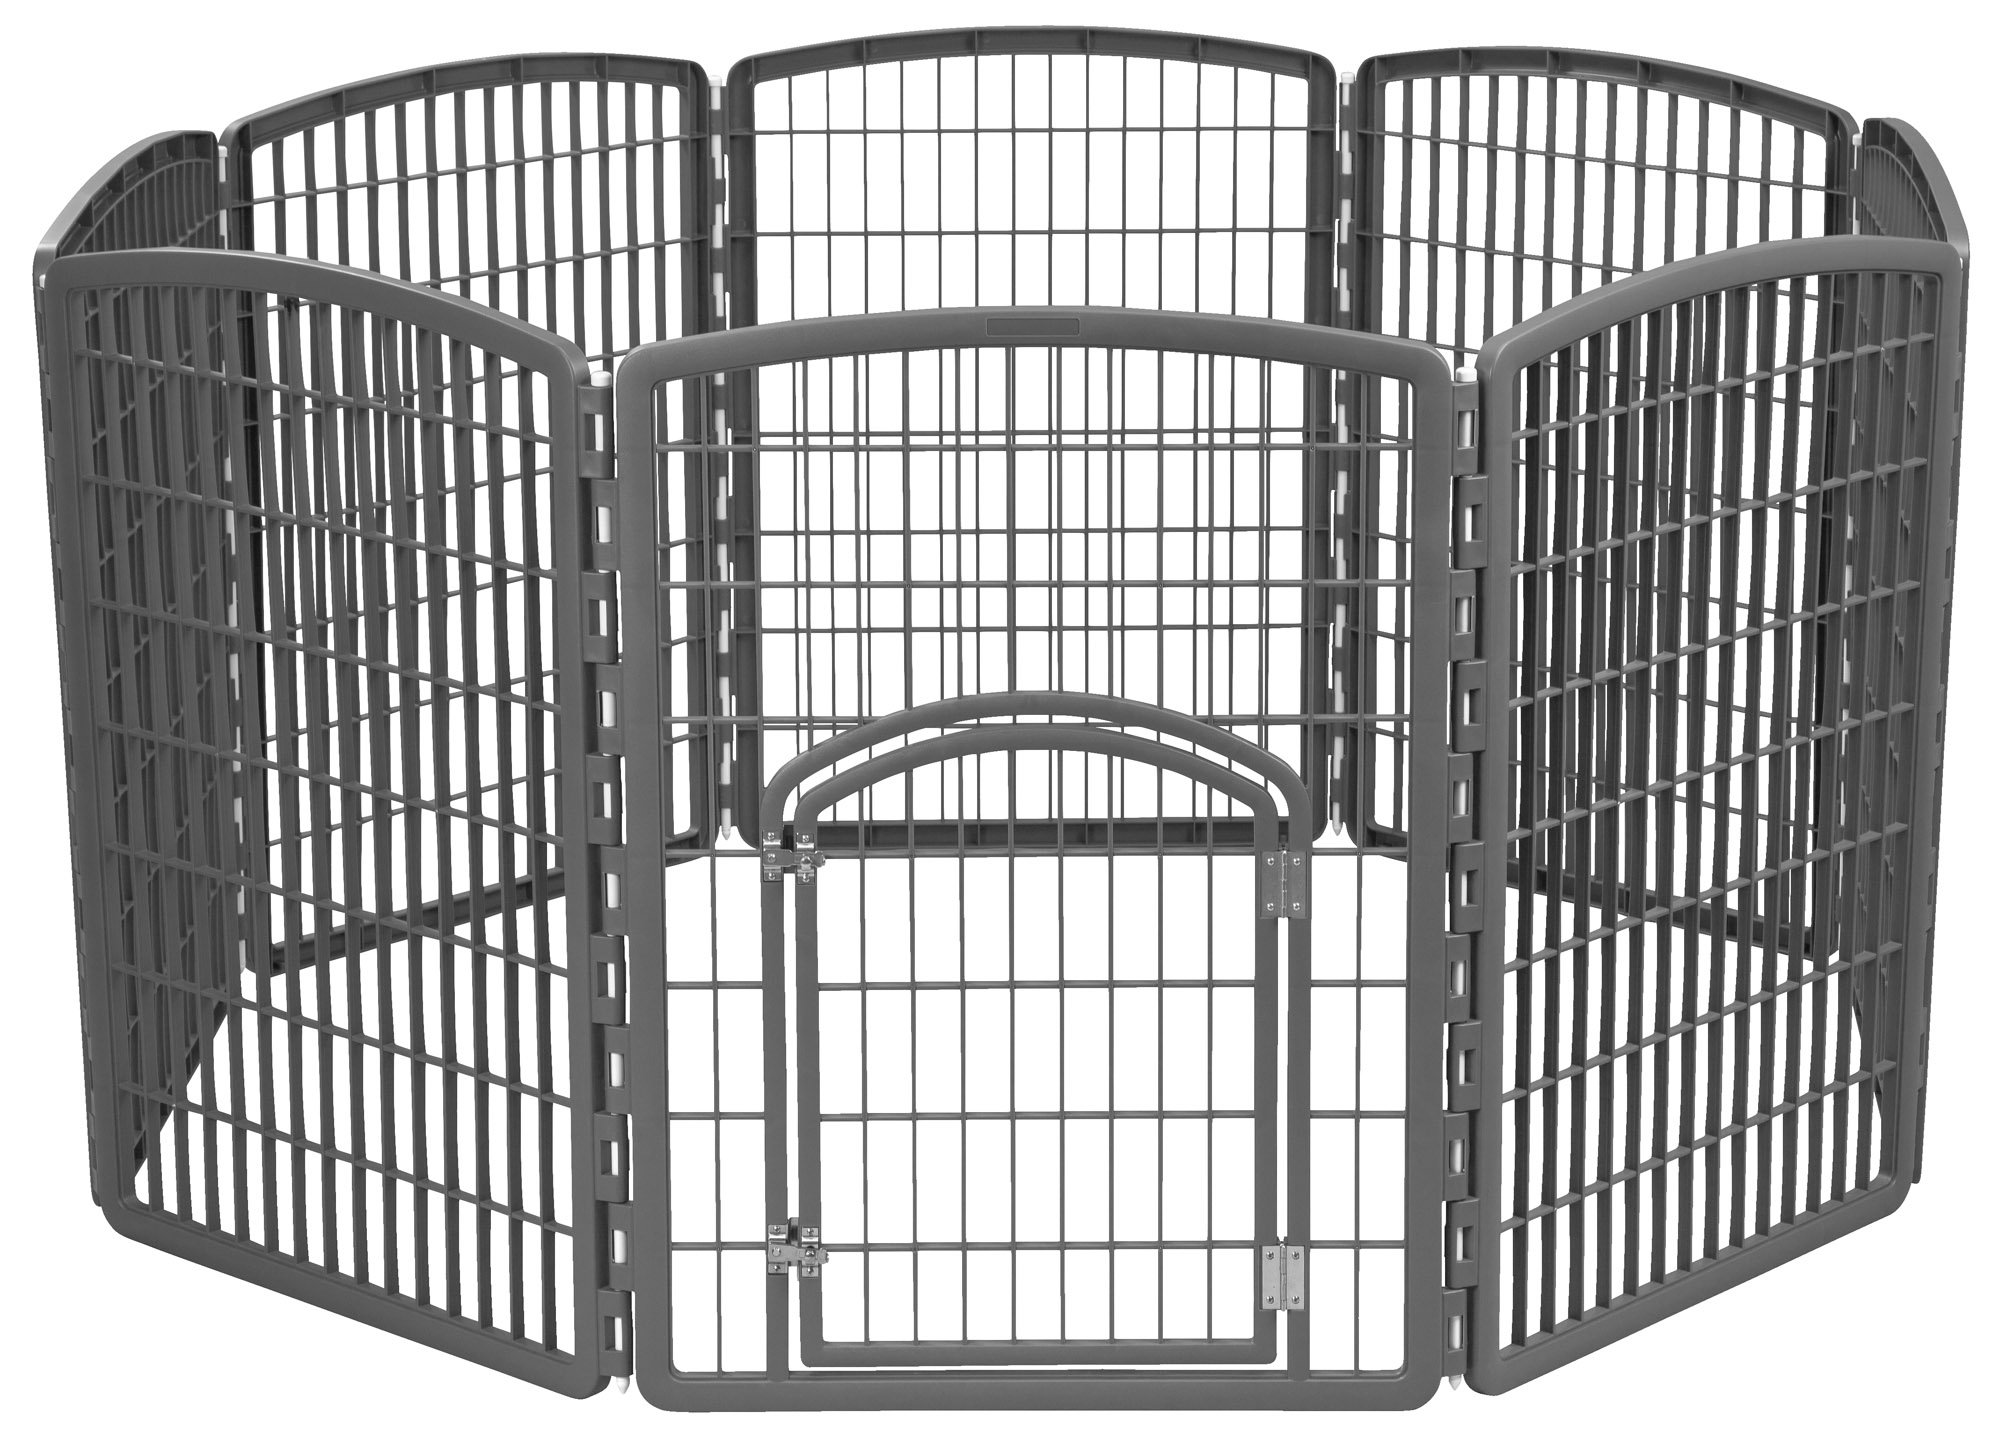 IRIS 34'' Exercise 8-Panel Pet Playpen without Door, Dark Gray by IRIS USA, Inc.